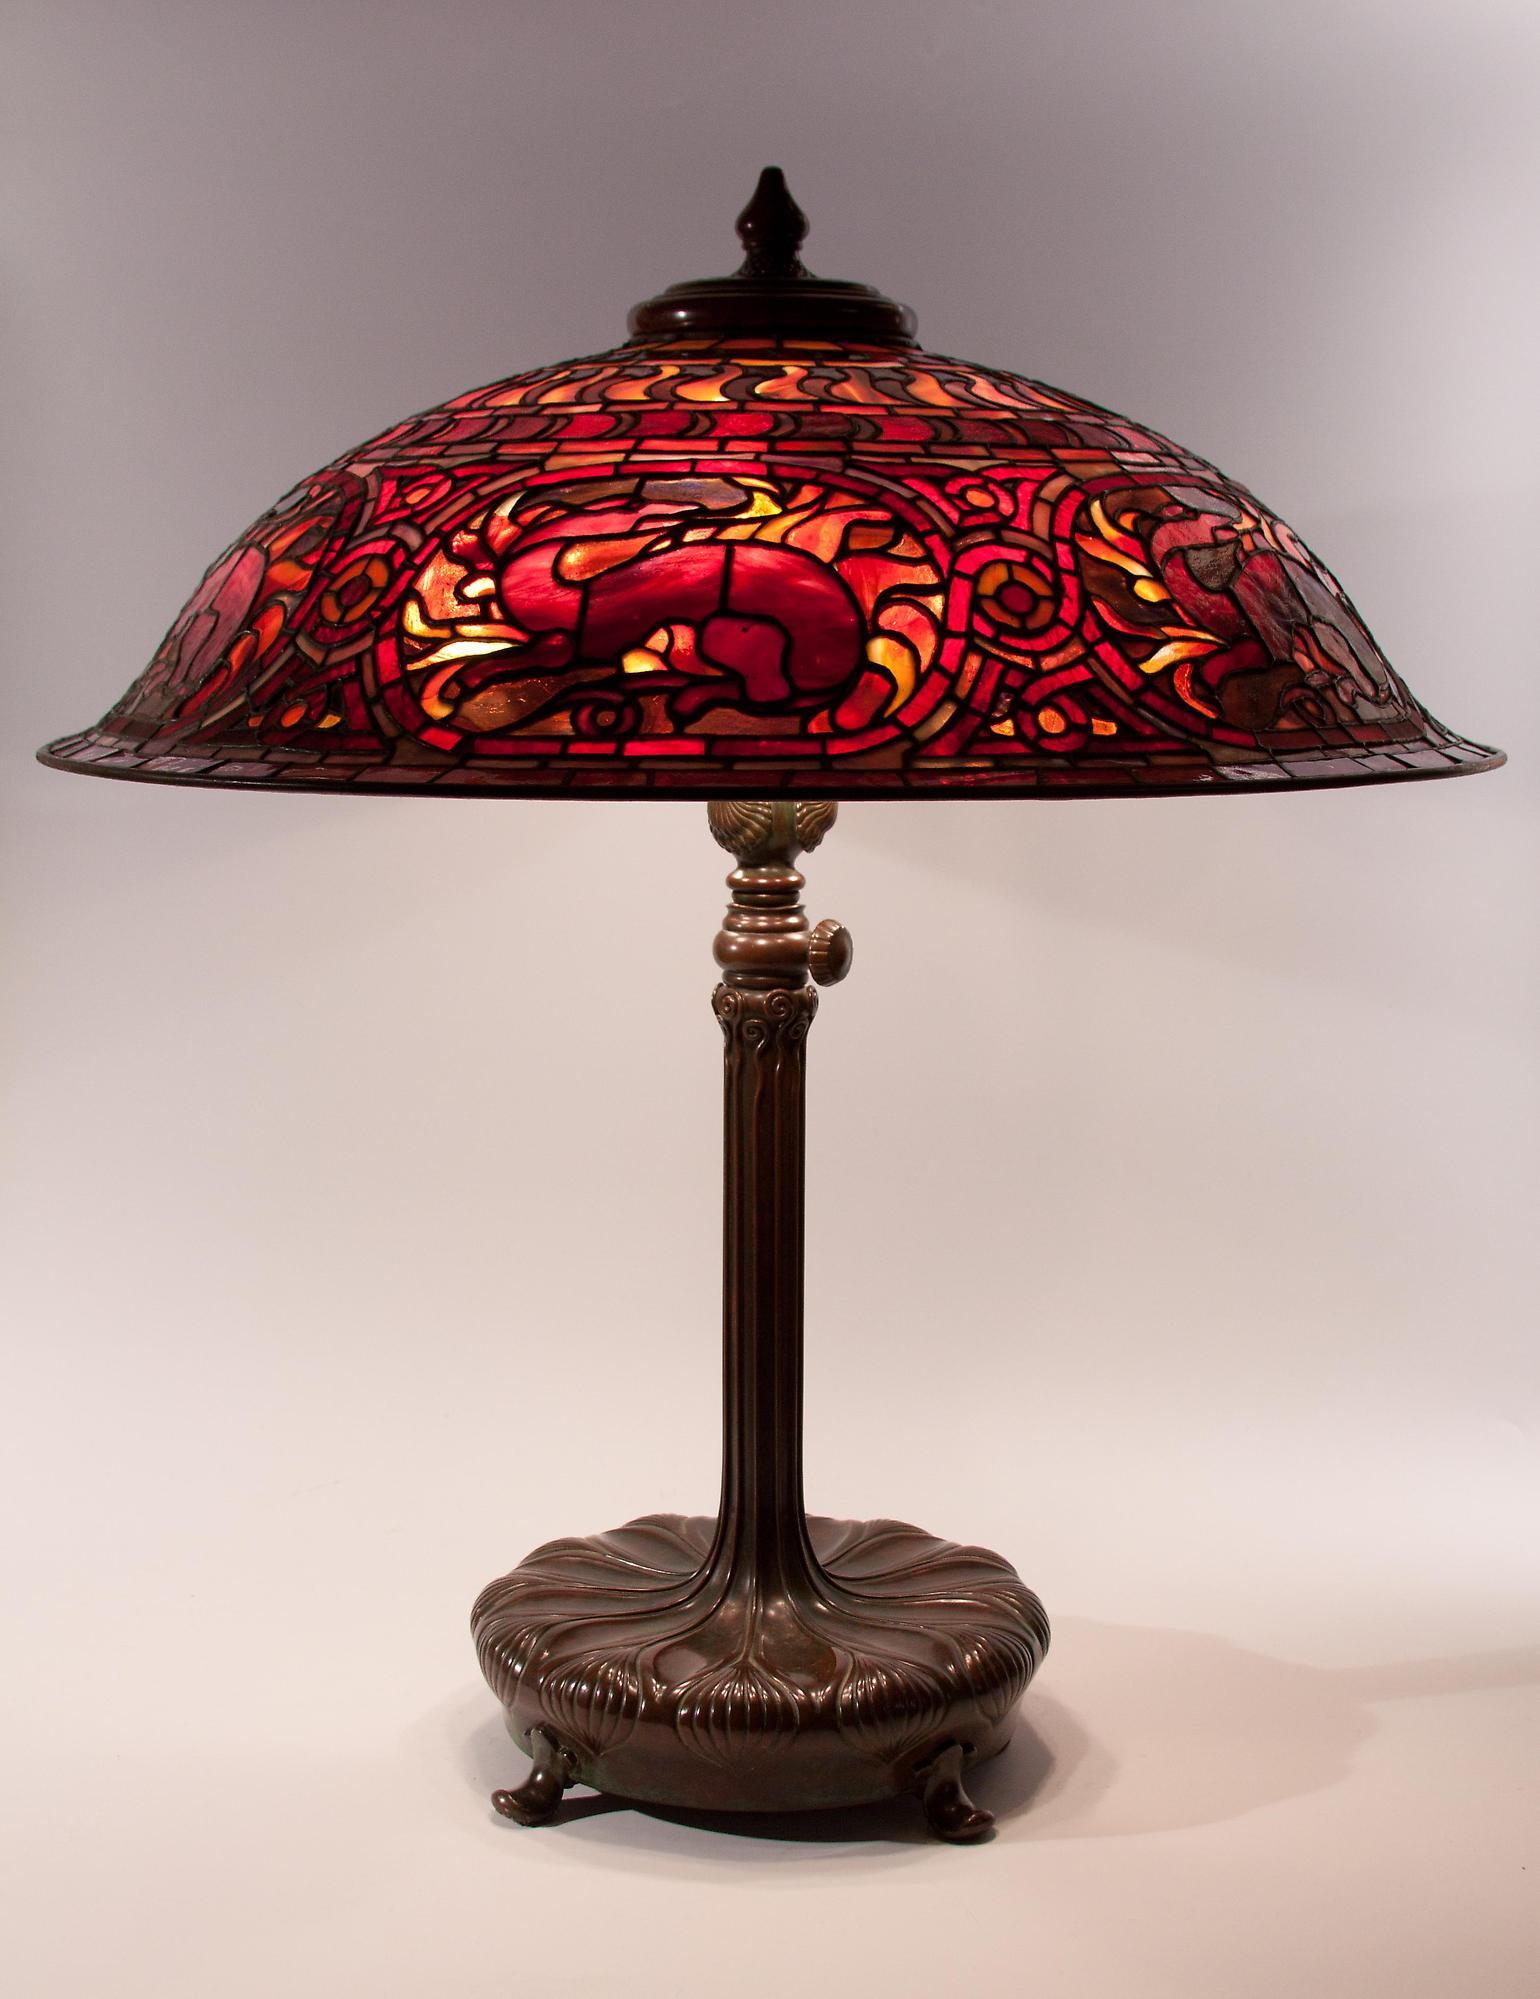 vintage-tiffany-lamps-photo-6